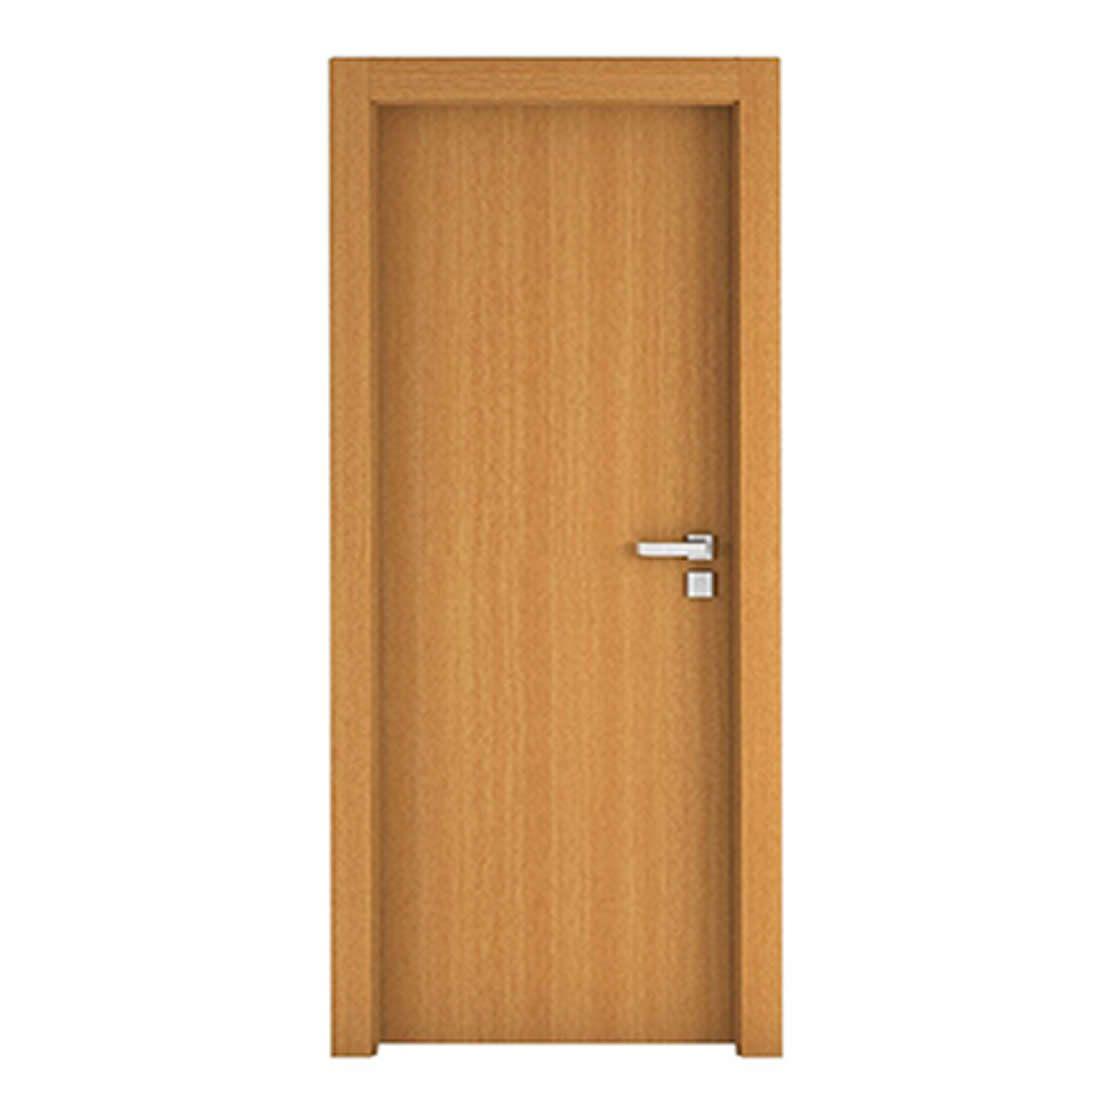 Kit Porta Concrem Wood 2,10 x 0,80 x 3,5 cm Esquerda Currupixá